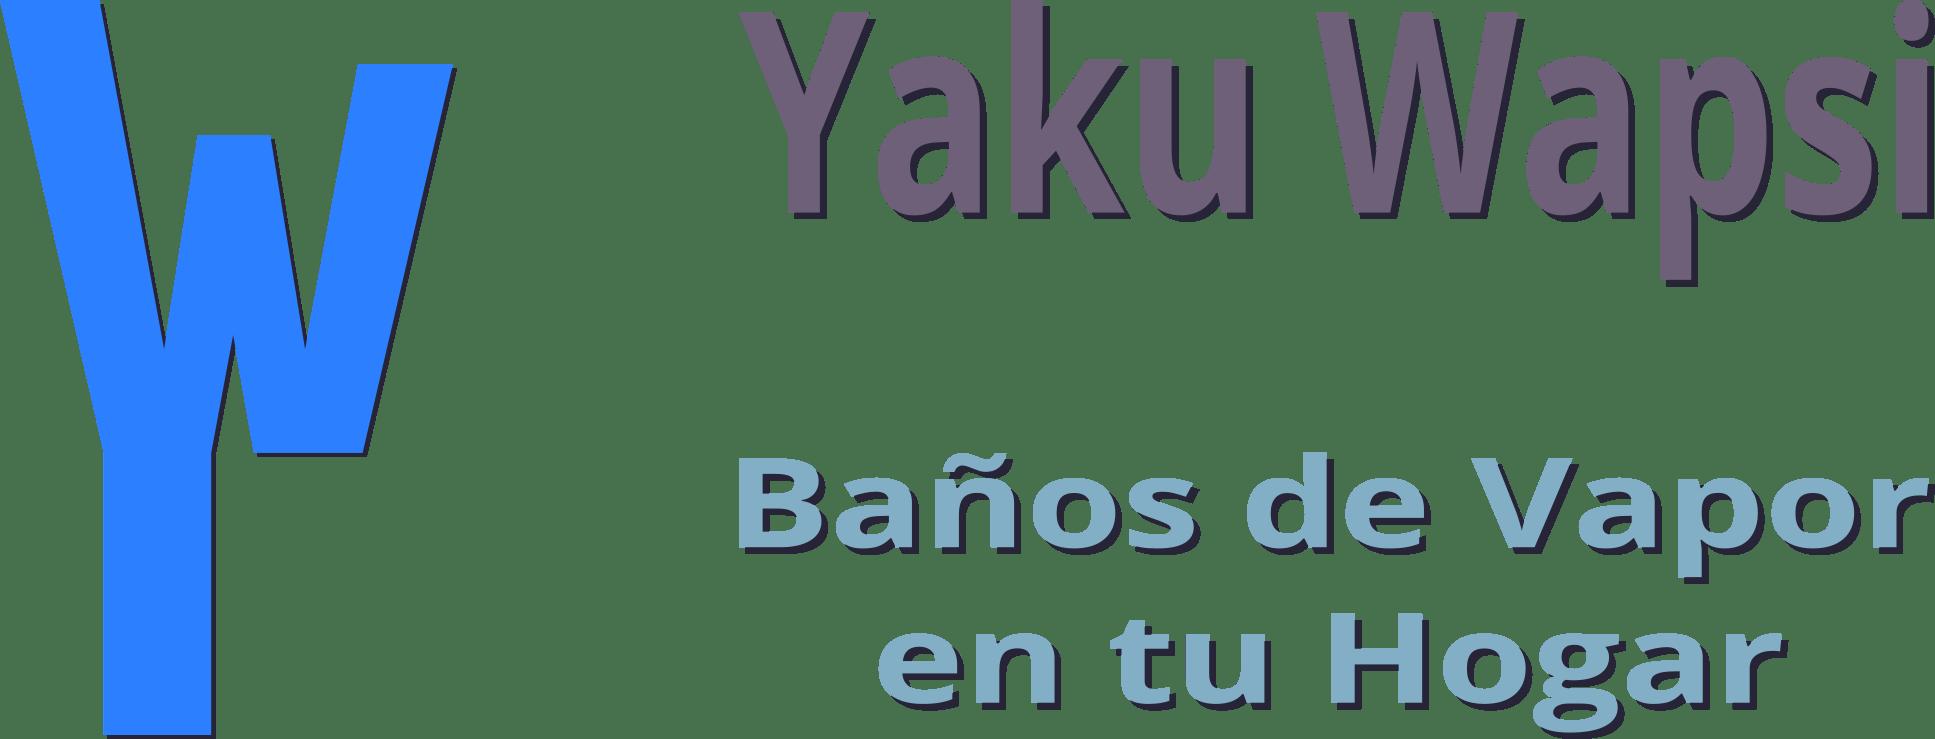 Yaku Wapsi